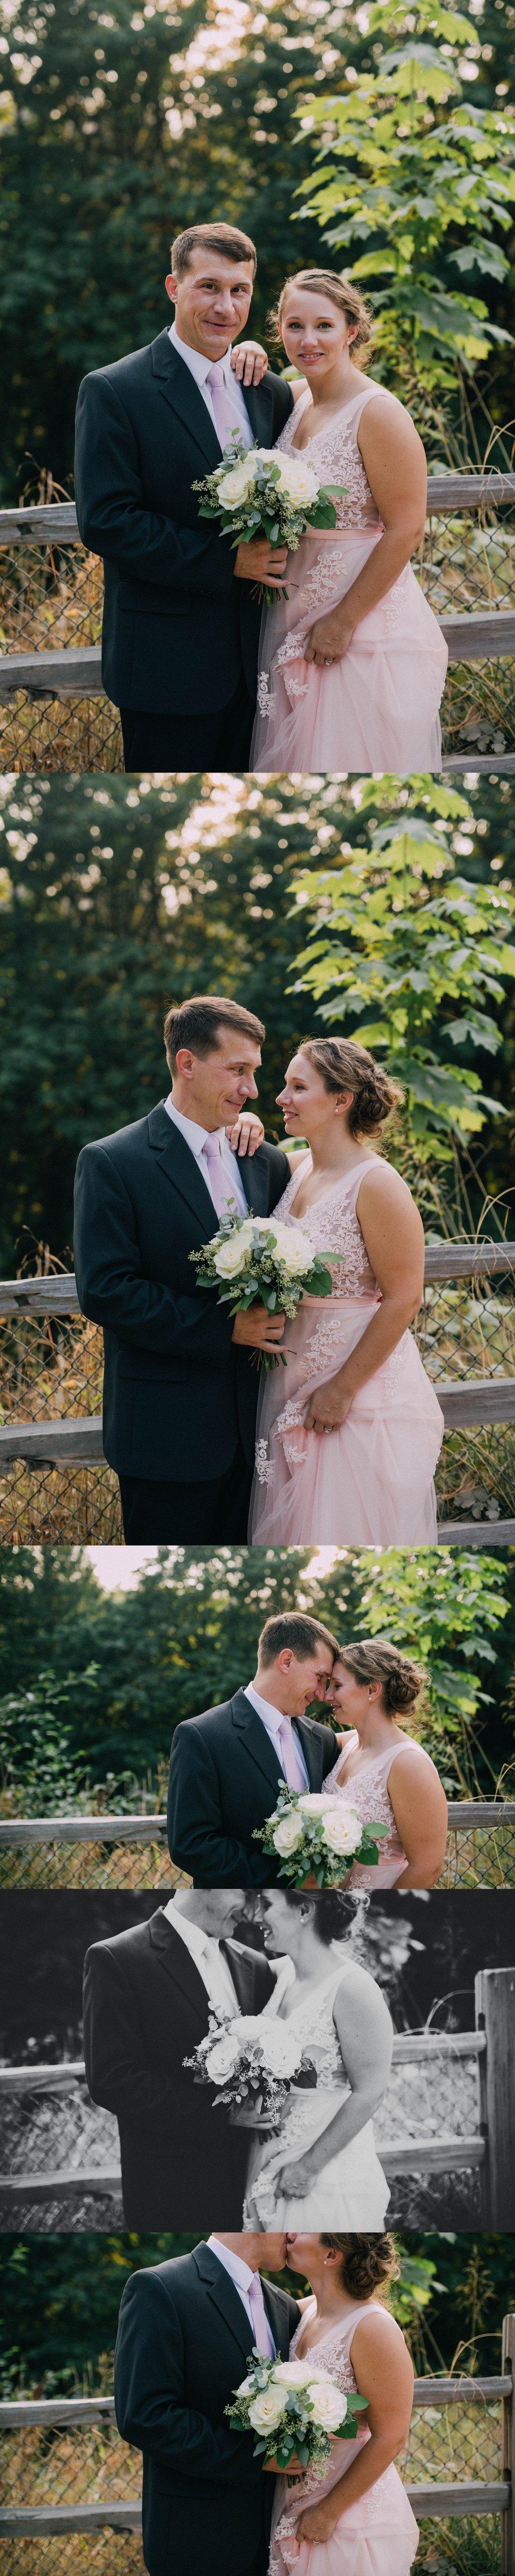 ashley_vos_seattle_ wedding_photographer_0487.jpg